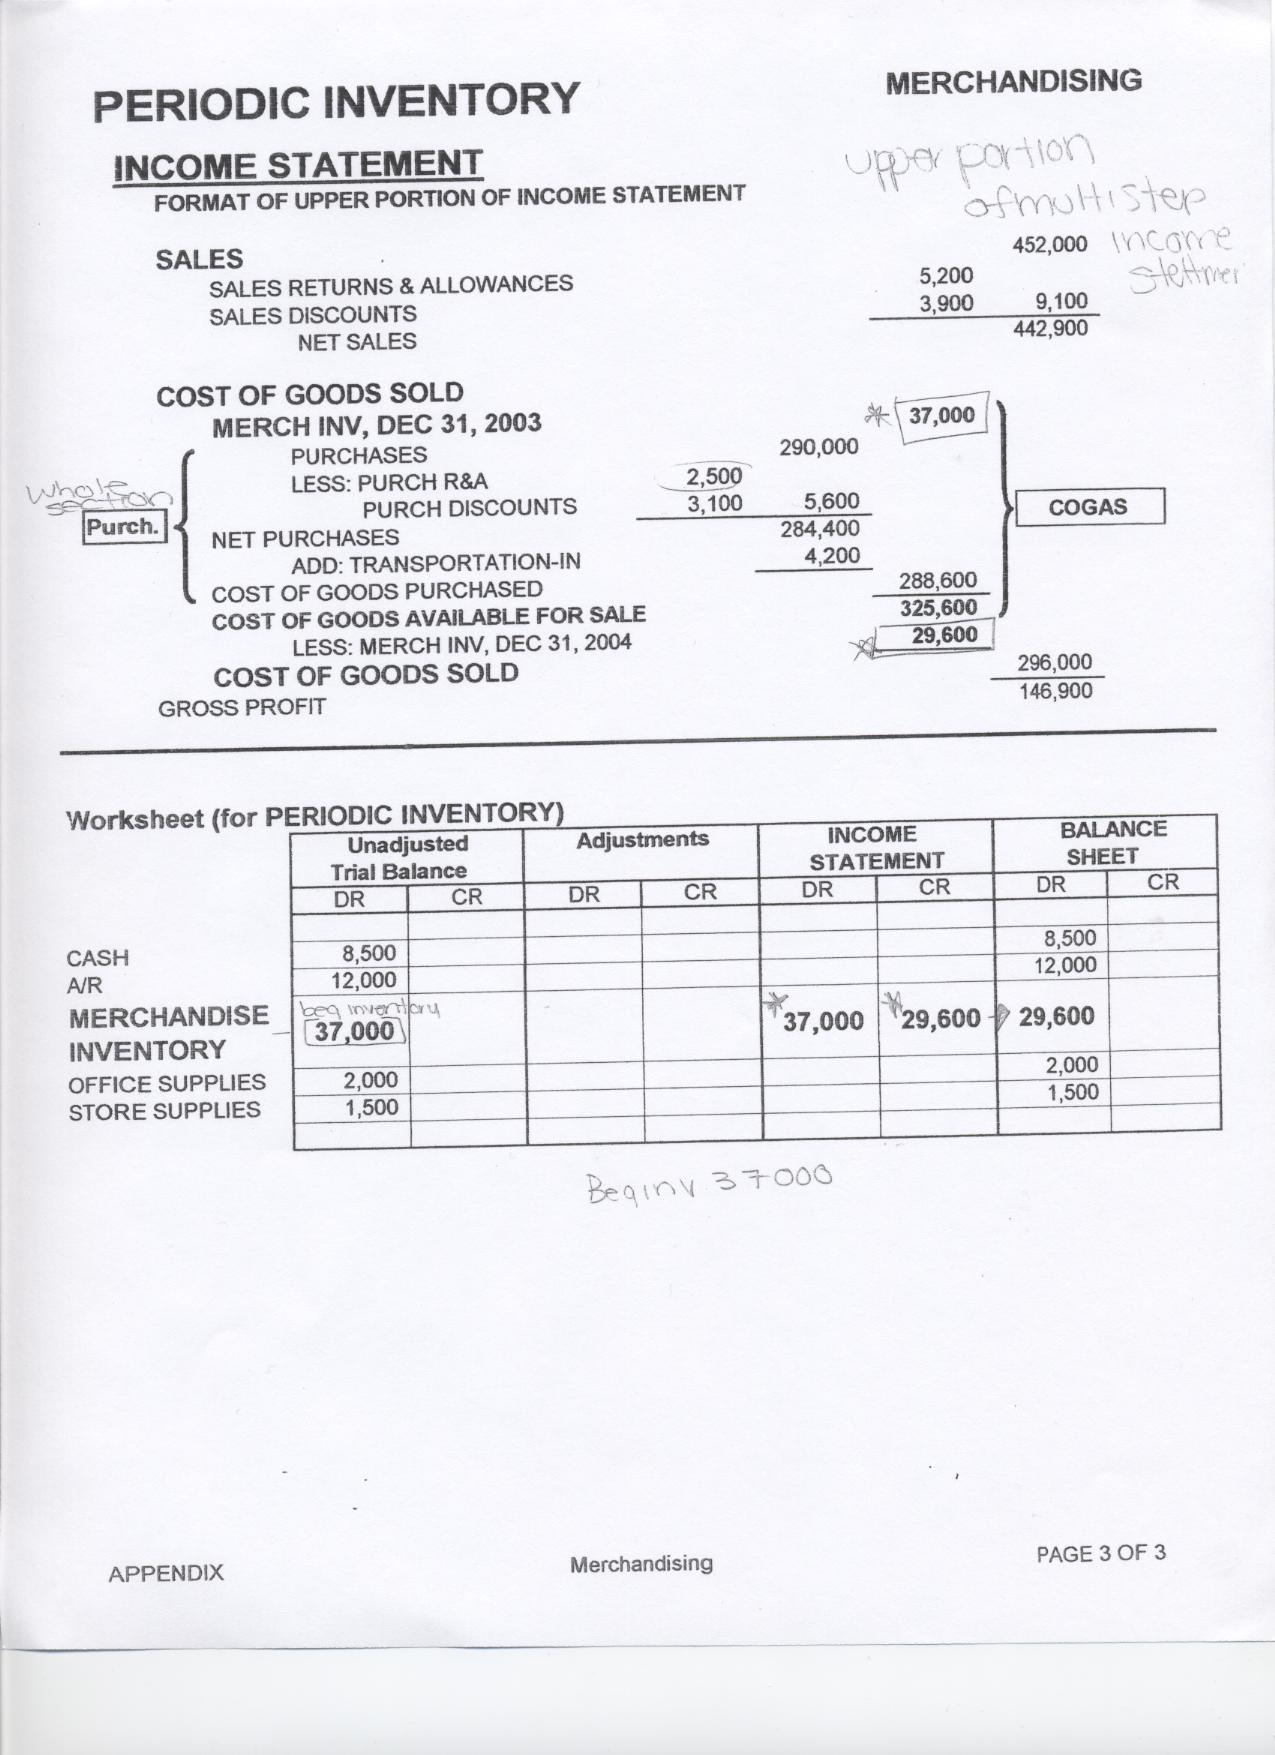 Accounting Midterm 2 Cheat Sheet Perpetual Vs Periodic